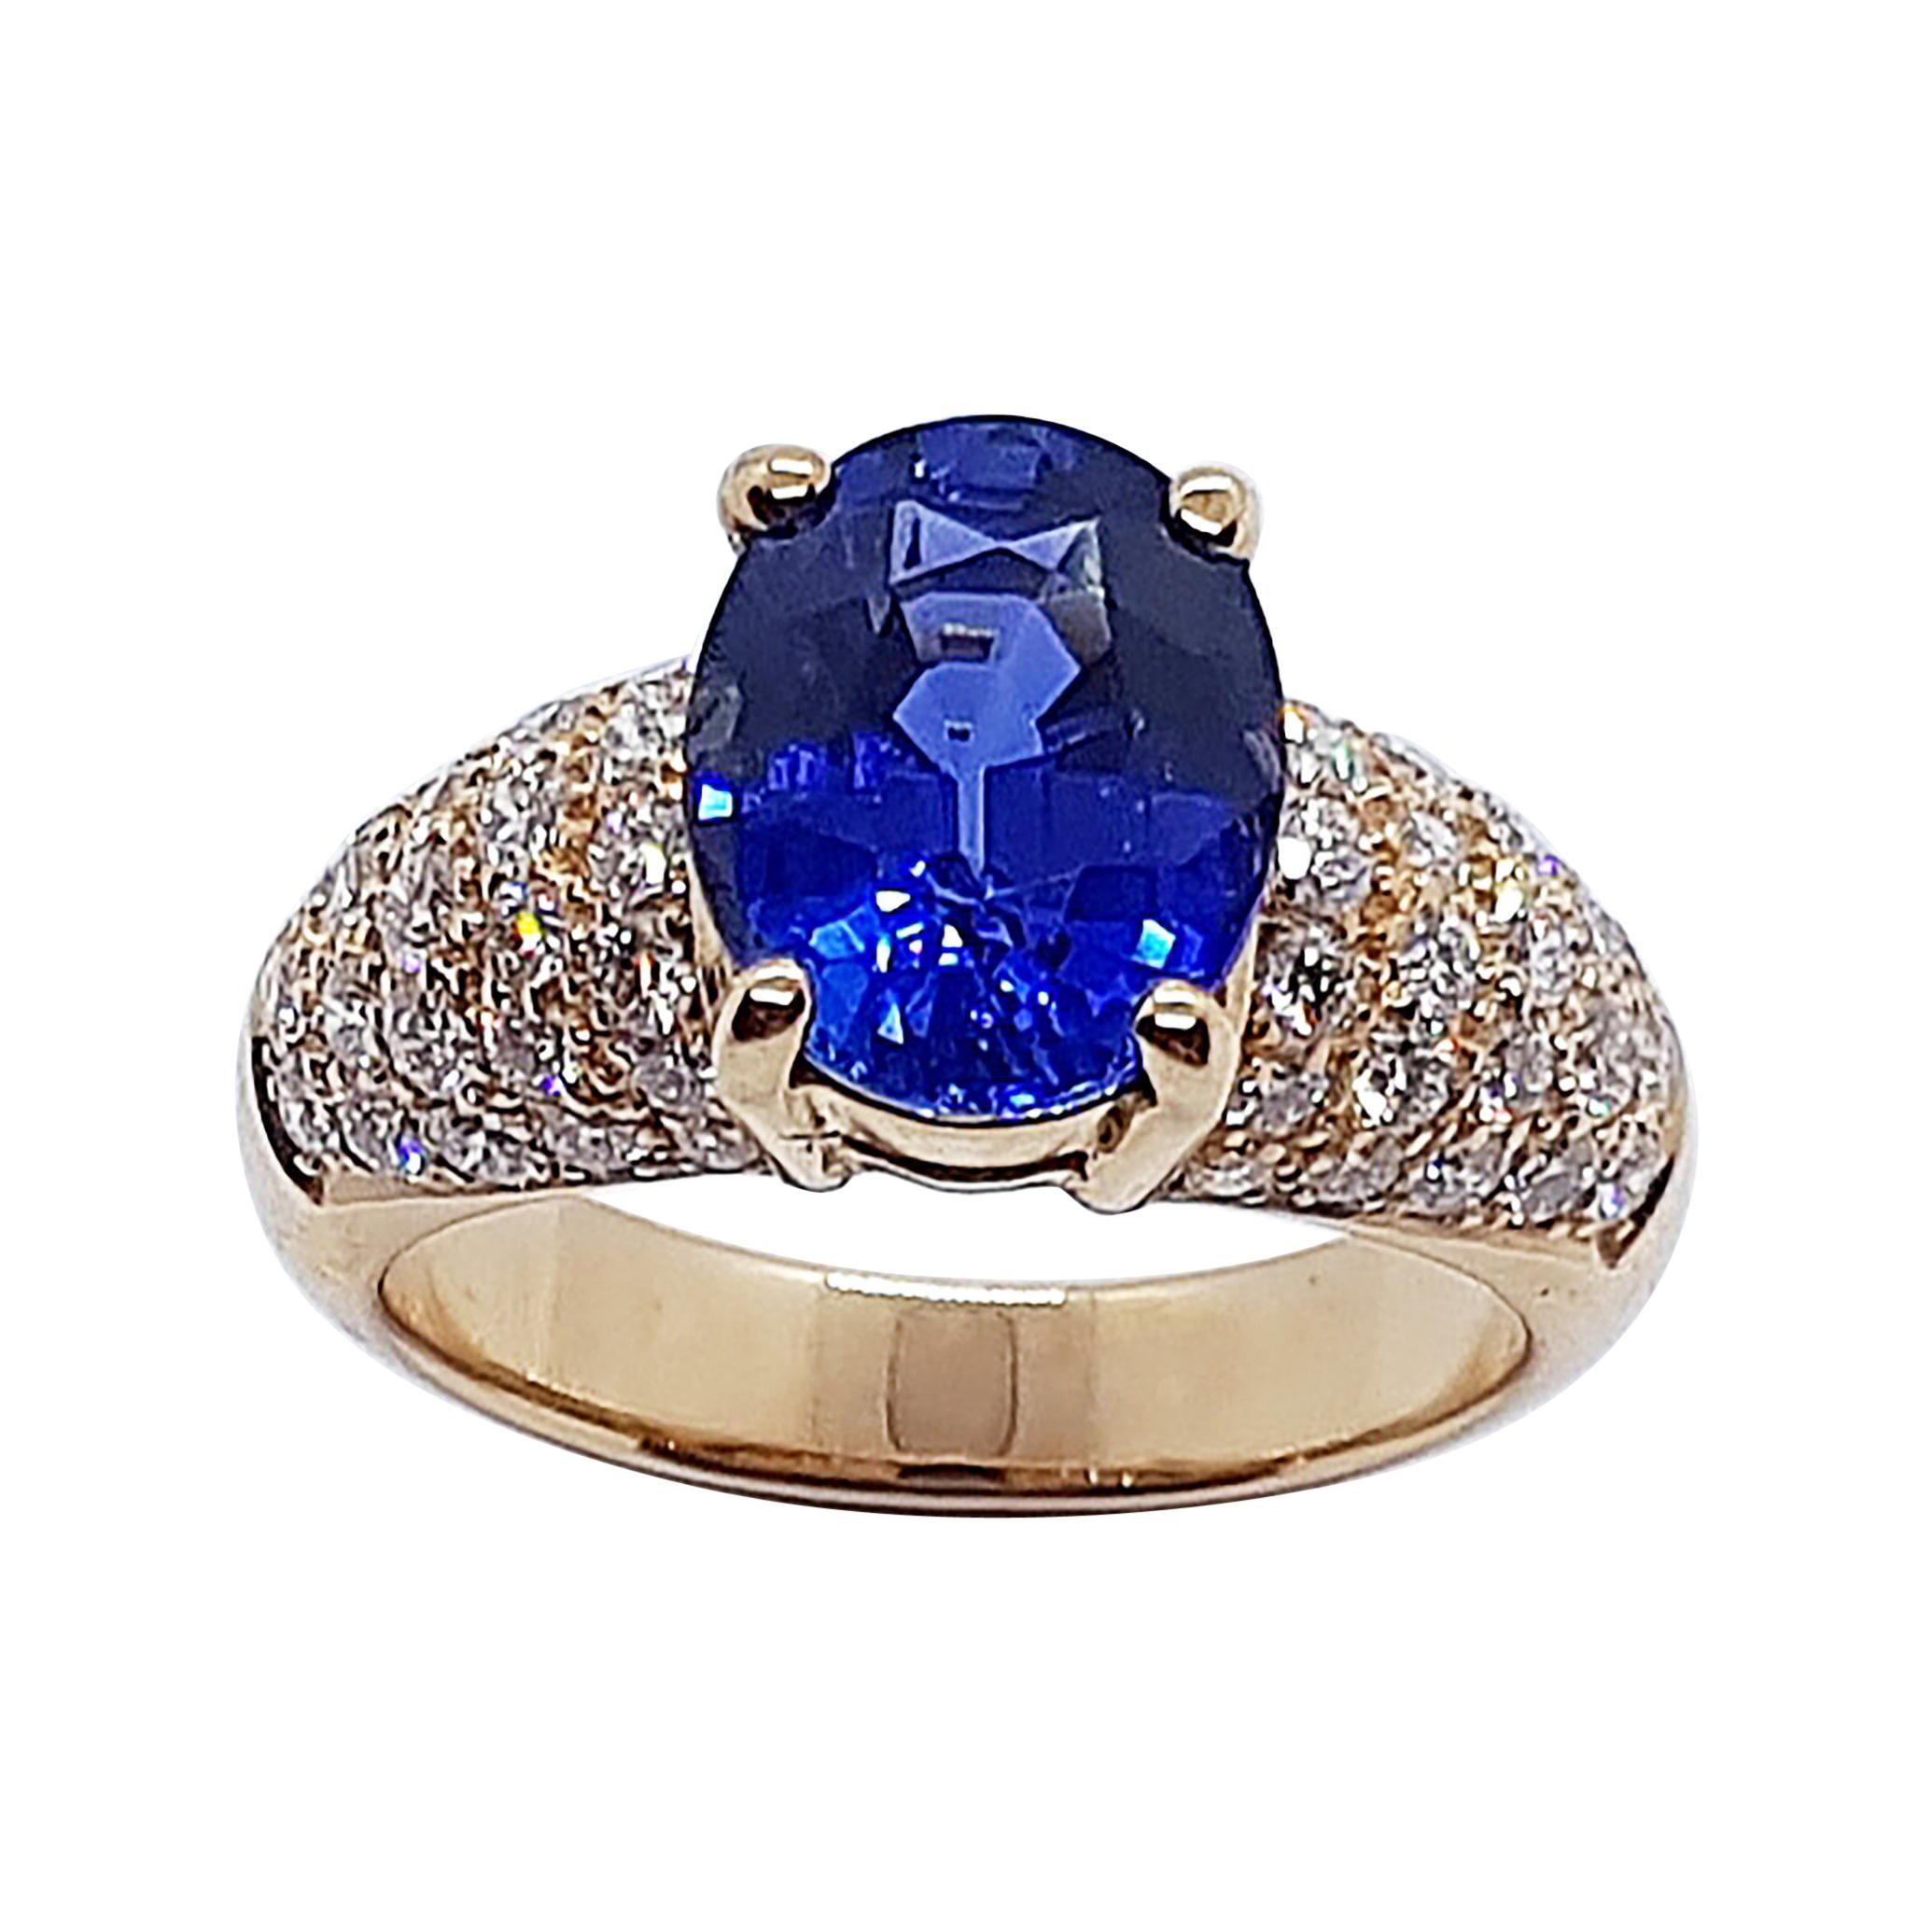 Certified Ceylon Blue Sapphire with Diamond Ring Set in 18 Karat Rose Gold